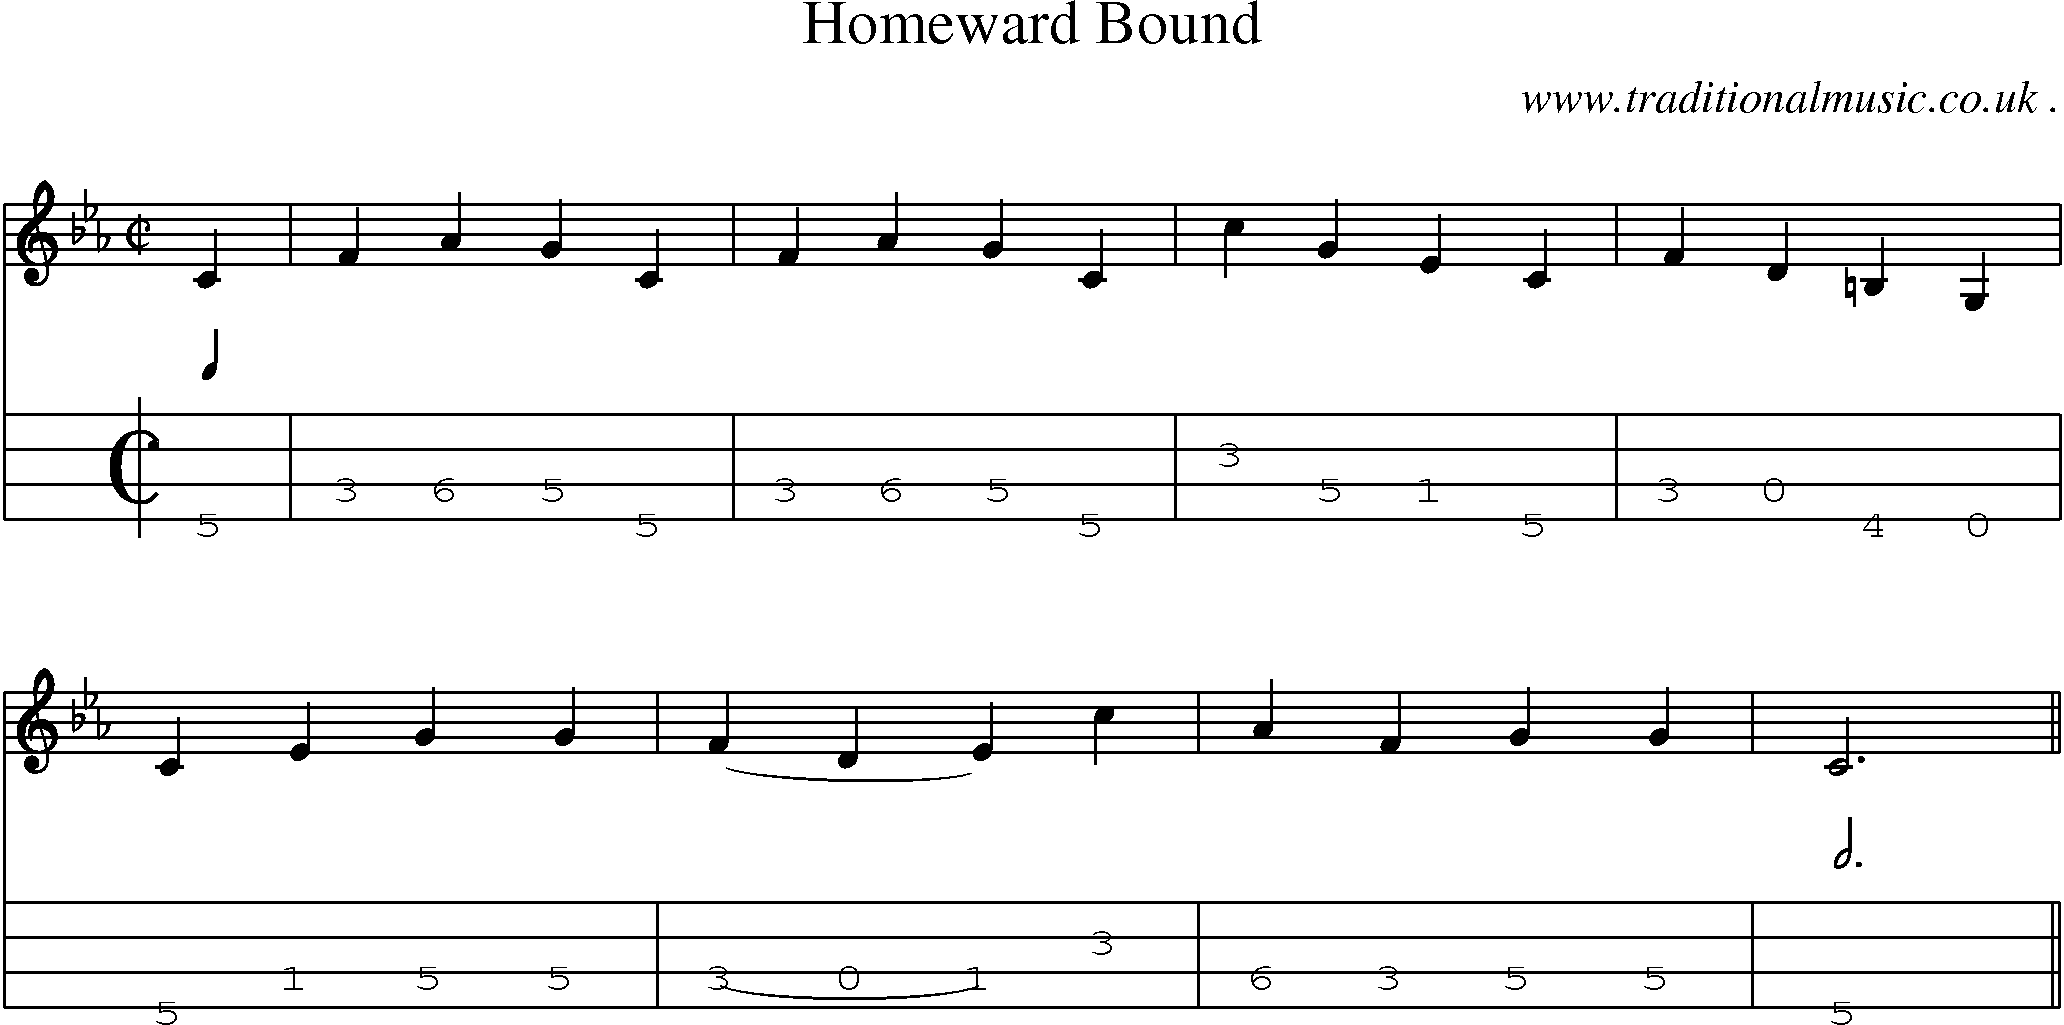 Sheet Music And Mandolin Tabs For Homeward Bound